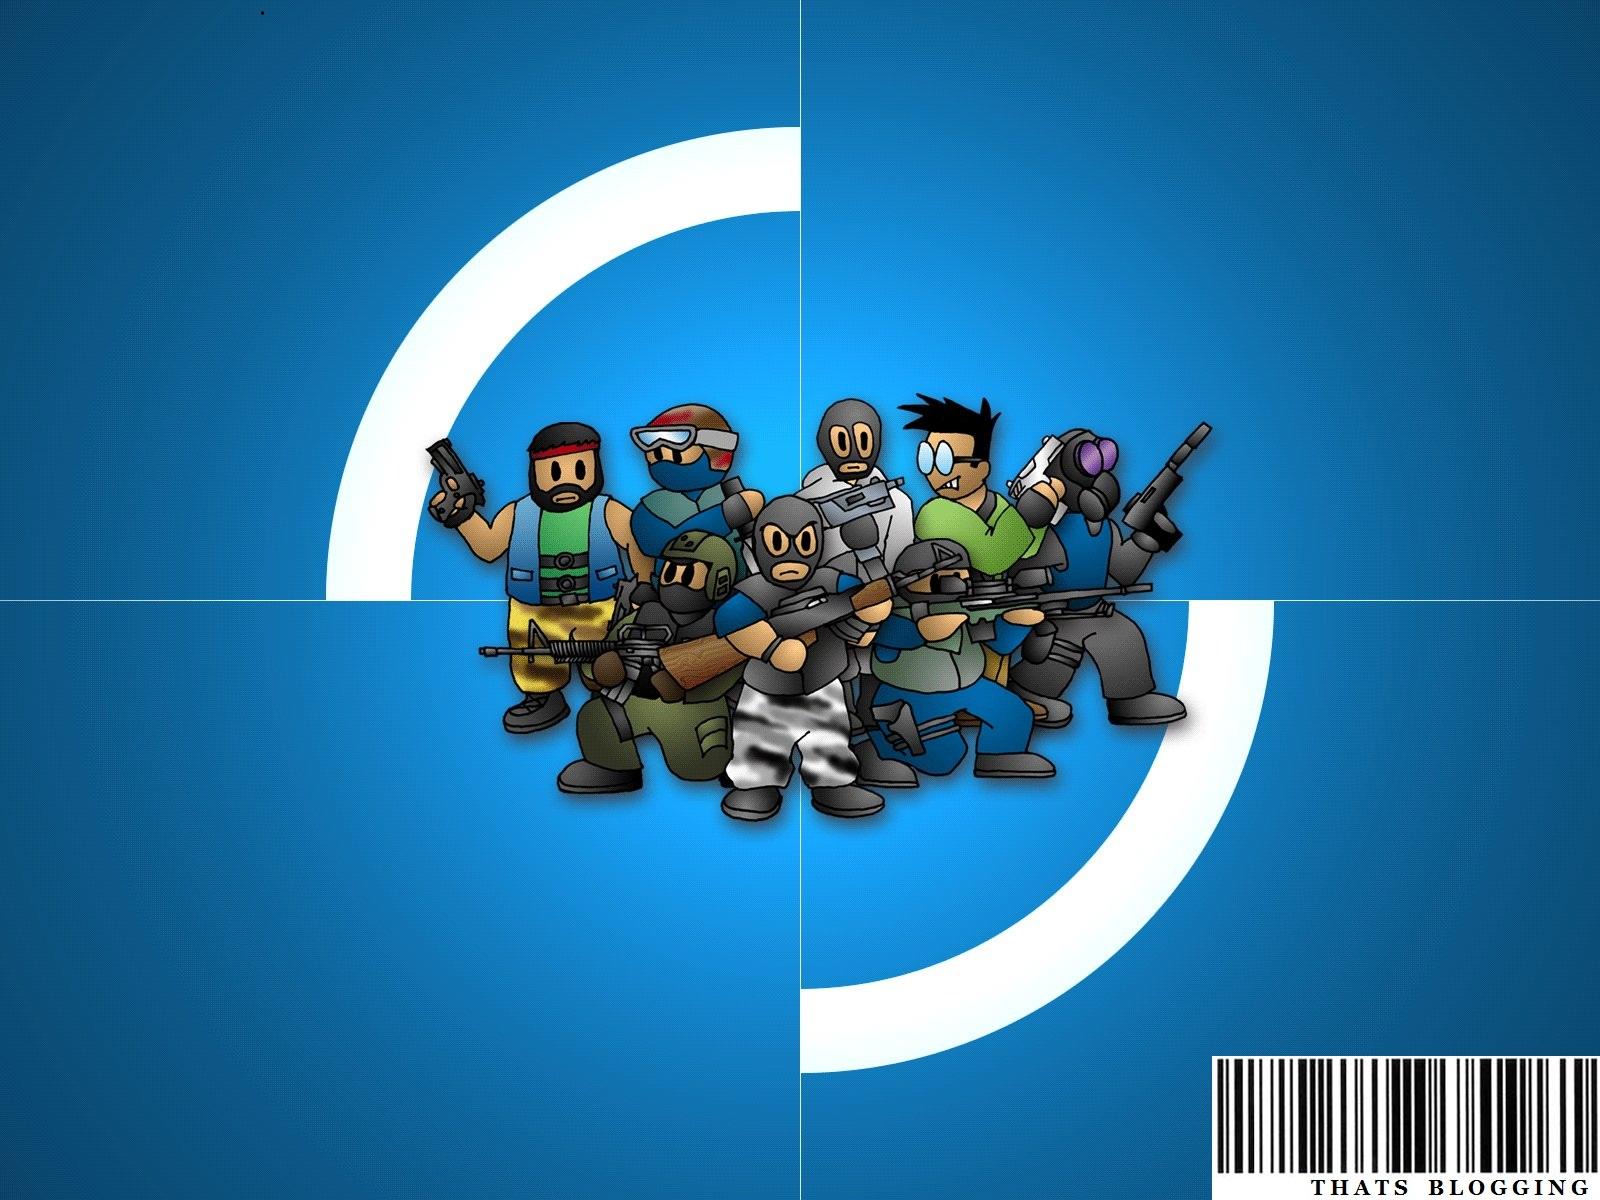 Samurai Wallpaper Iphone 6 Download Counter Strike 1 6 High Definition Wallpapers